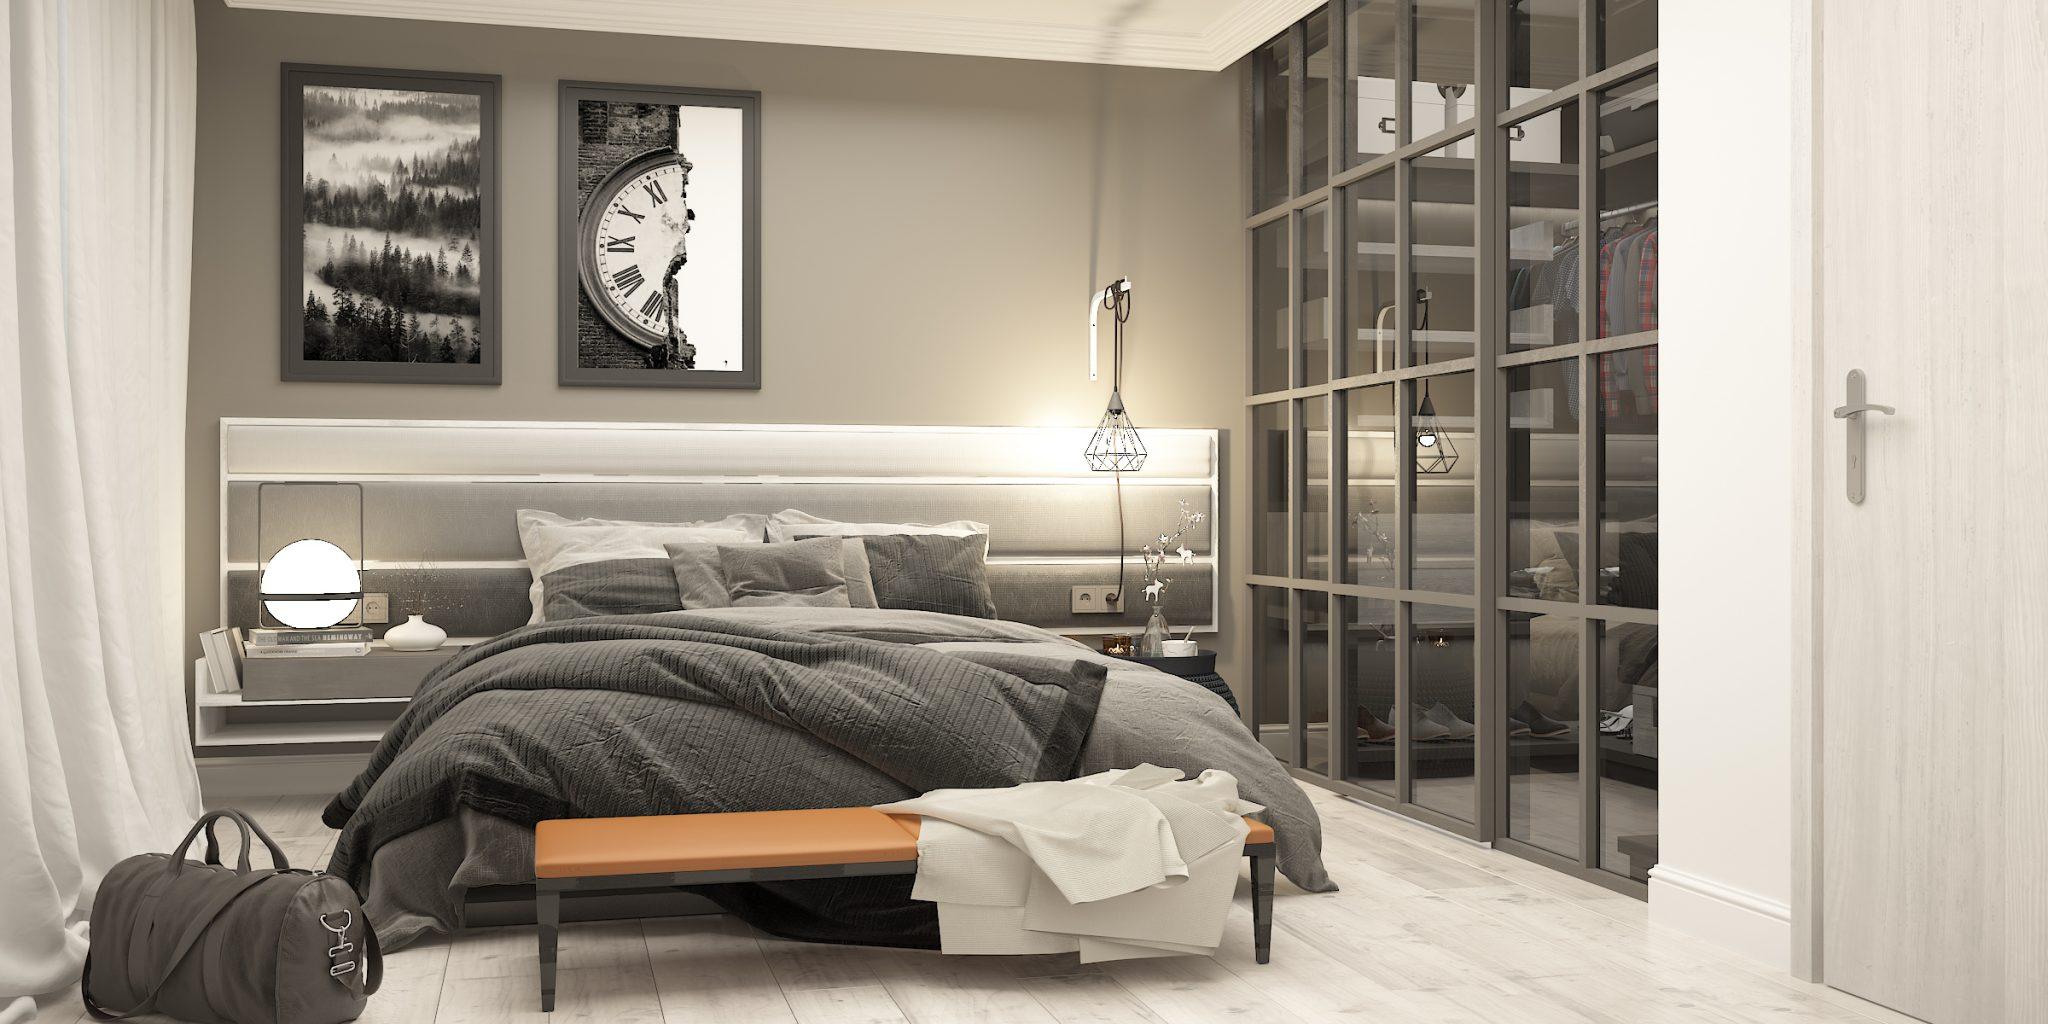 apartment-interior-bedroom